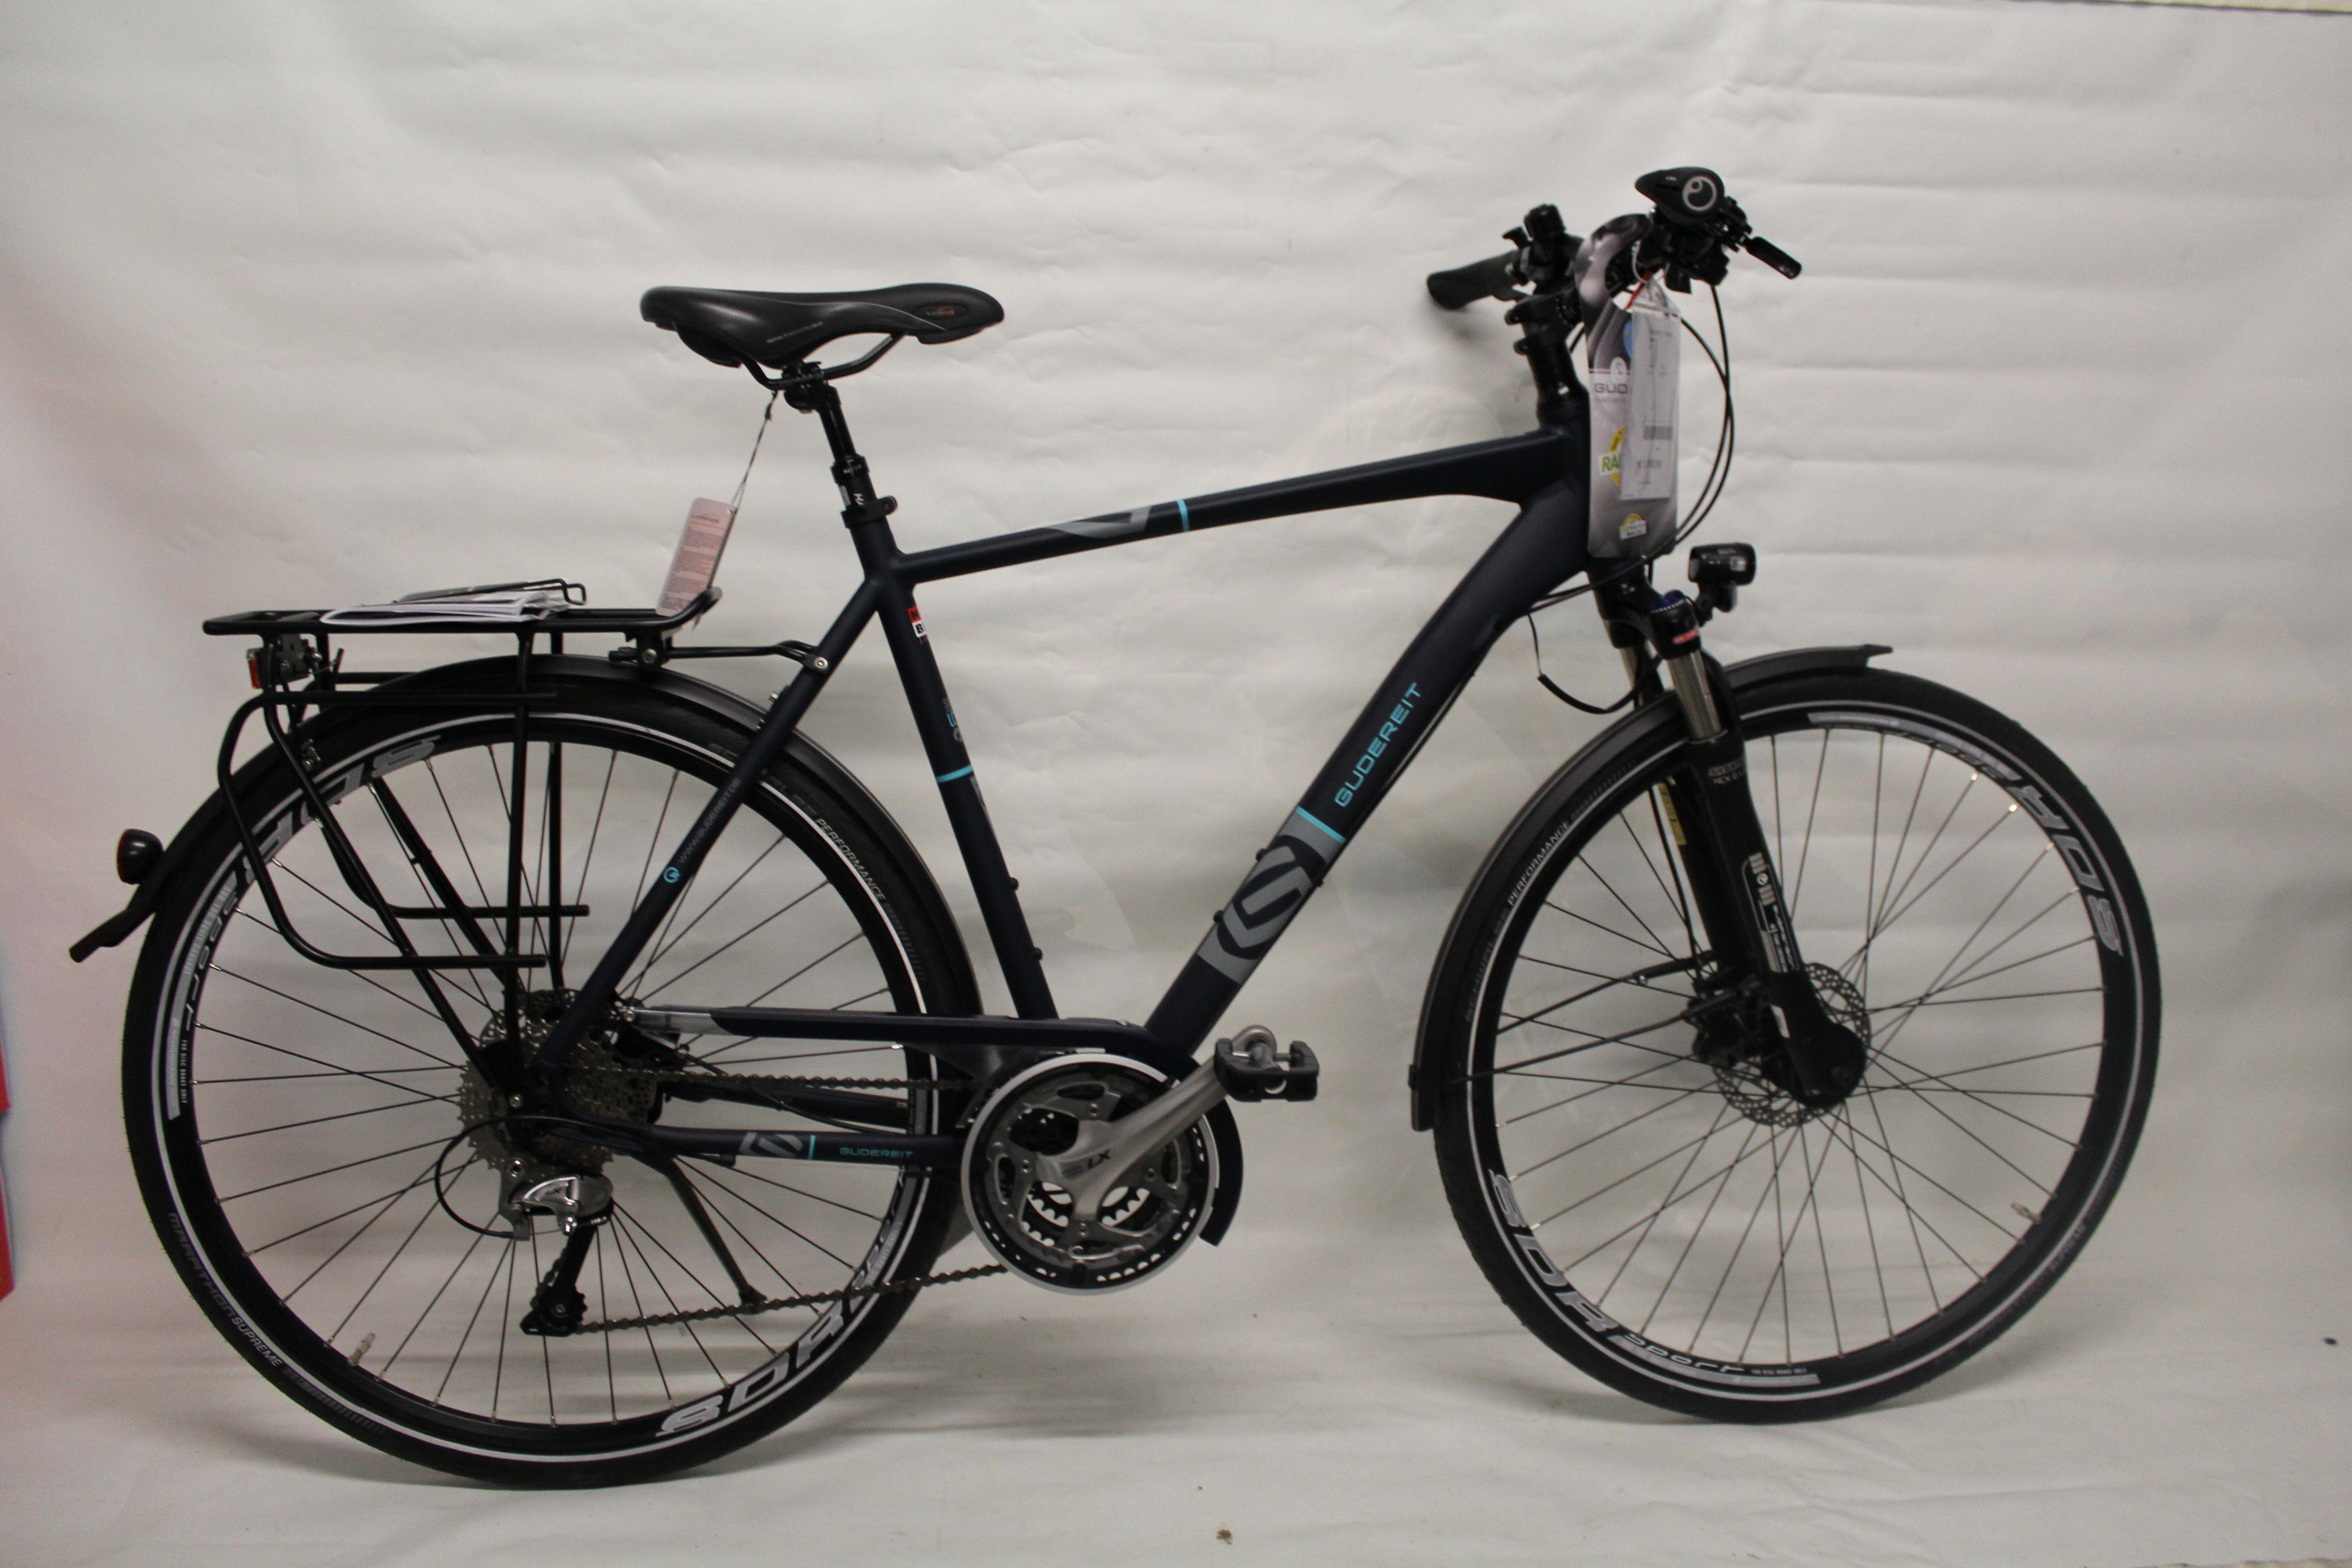 fahrrad e bike jetzt g nstig kaufen gudereit lc 75 evo. Black Bedroom Furniture Sets. Home Design Ideas